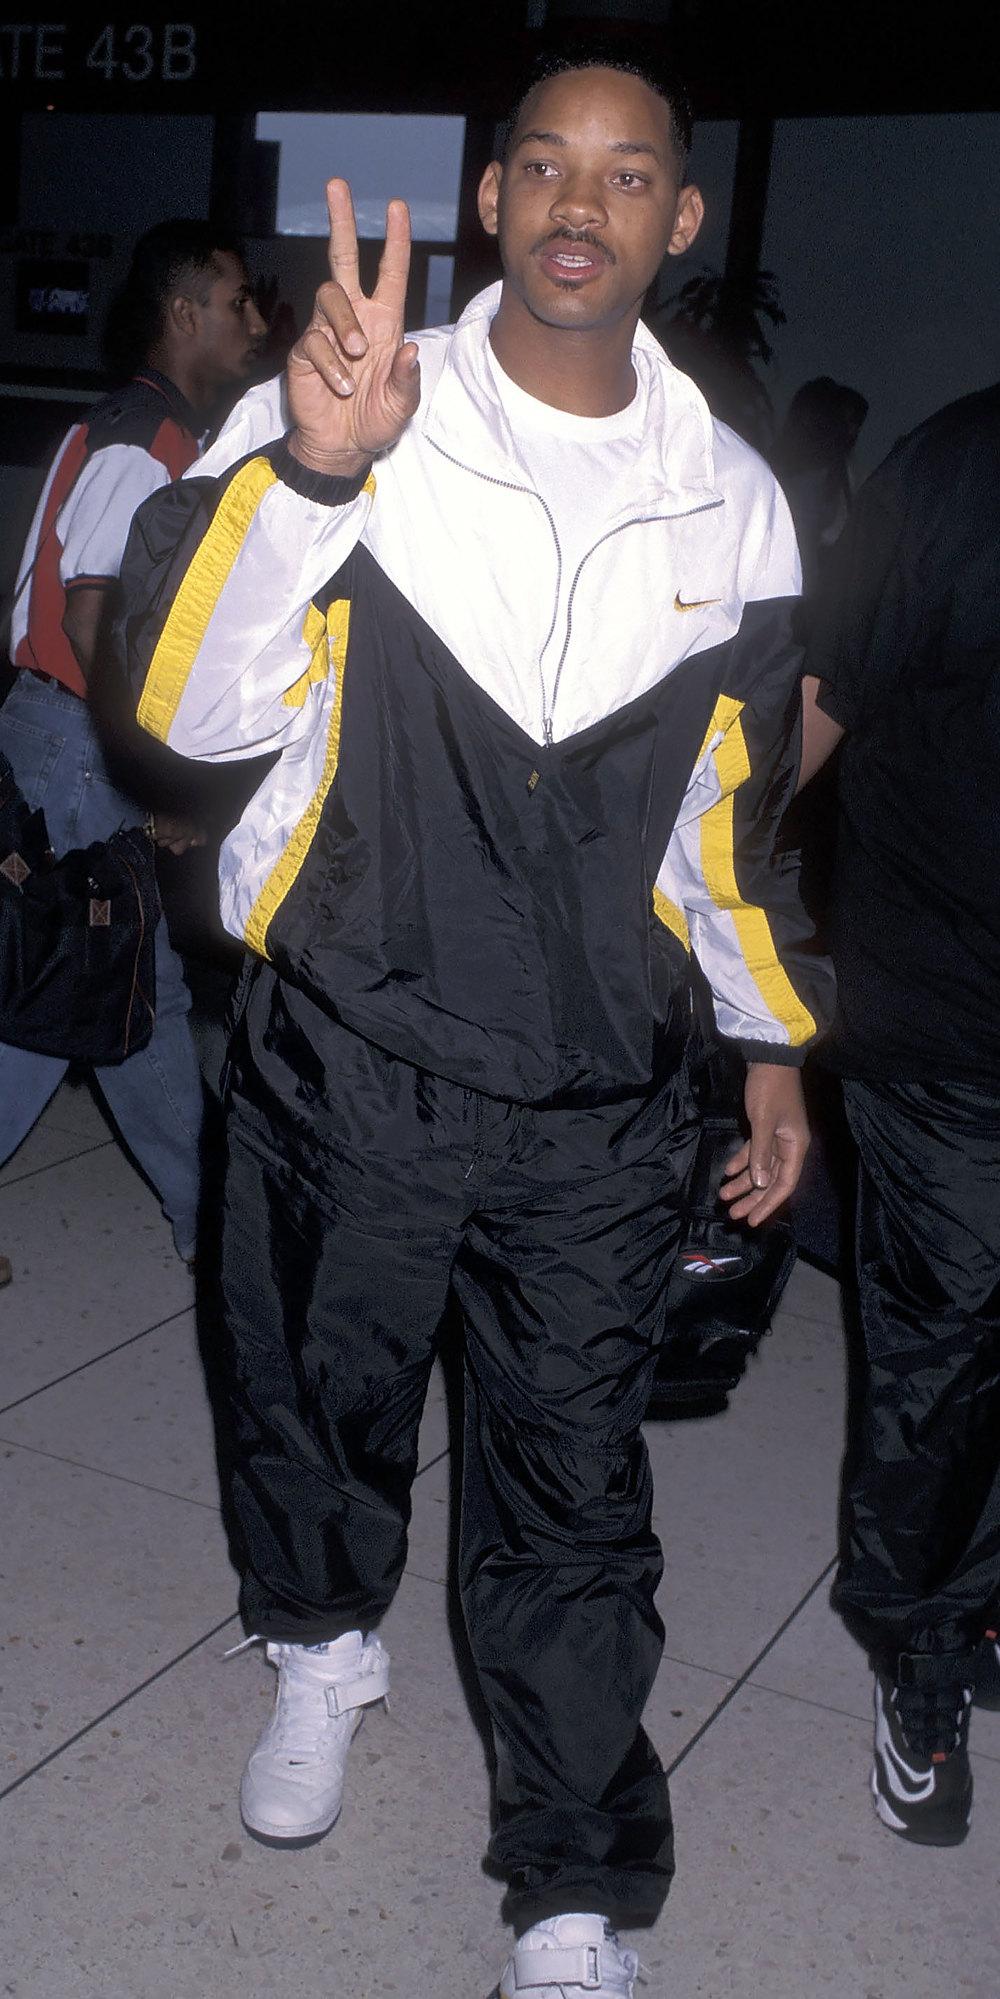 Уилл Смит ваэропорту Лос-Анджелеса, июнь 1996